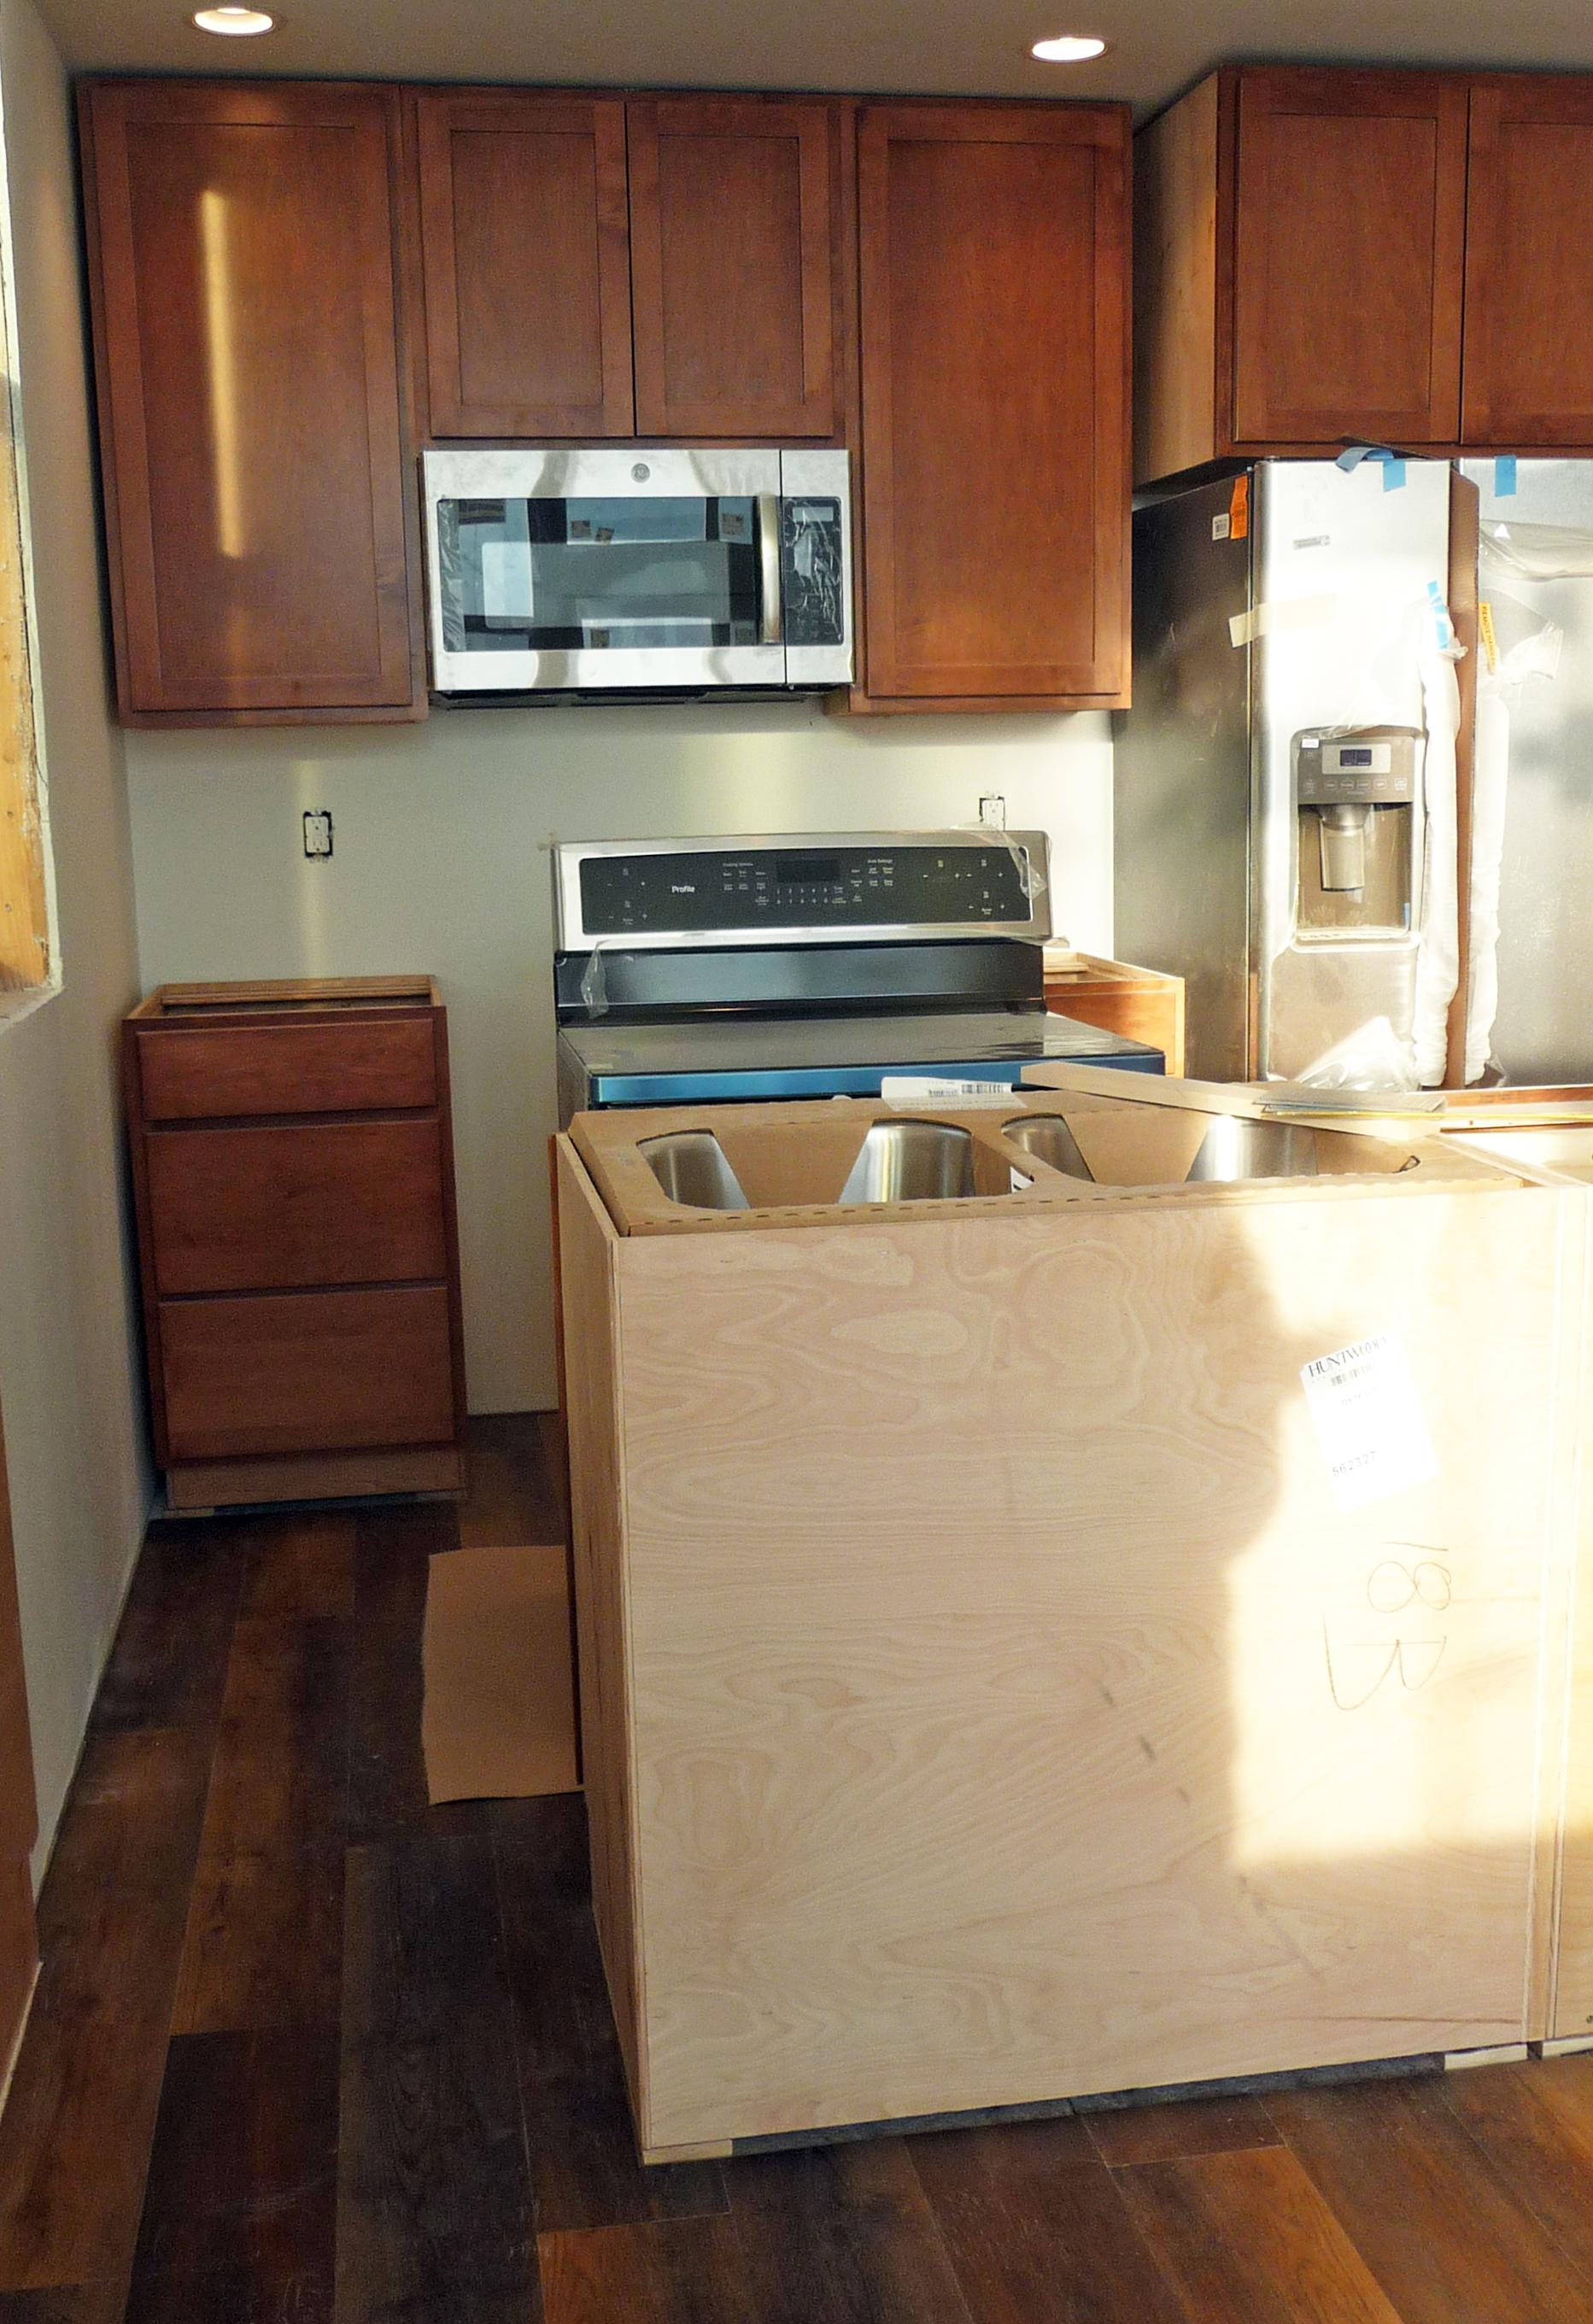 CanyonStreet.kitchen.03.14.2019.jpg